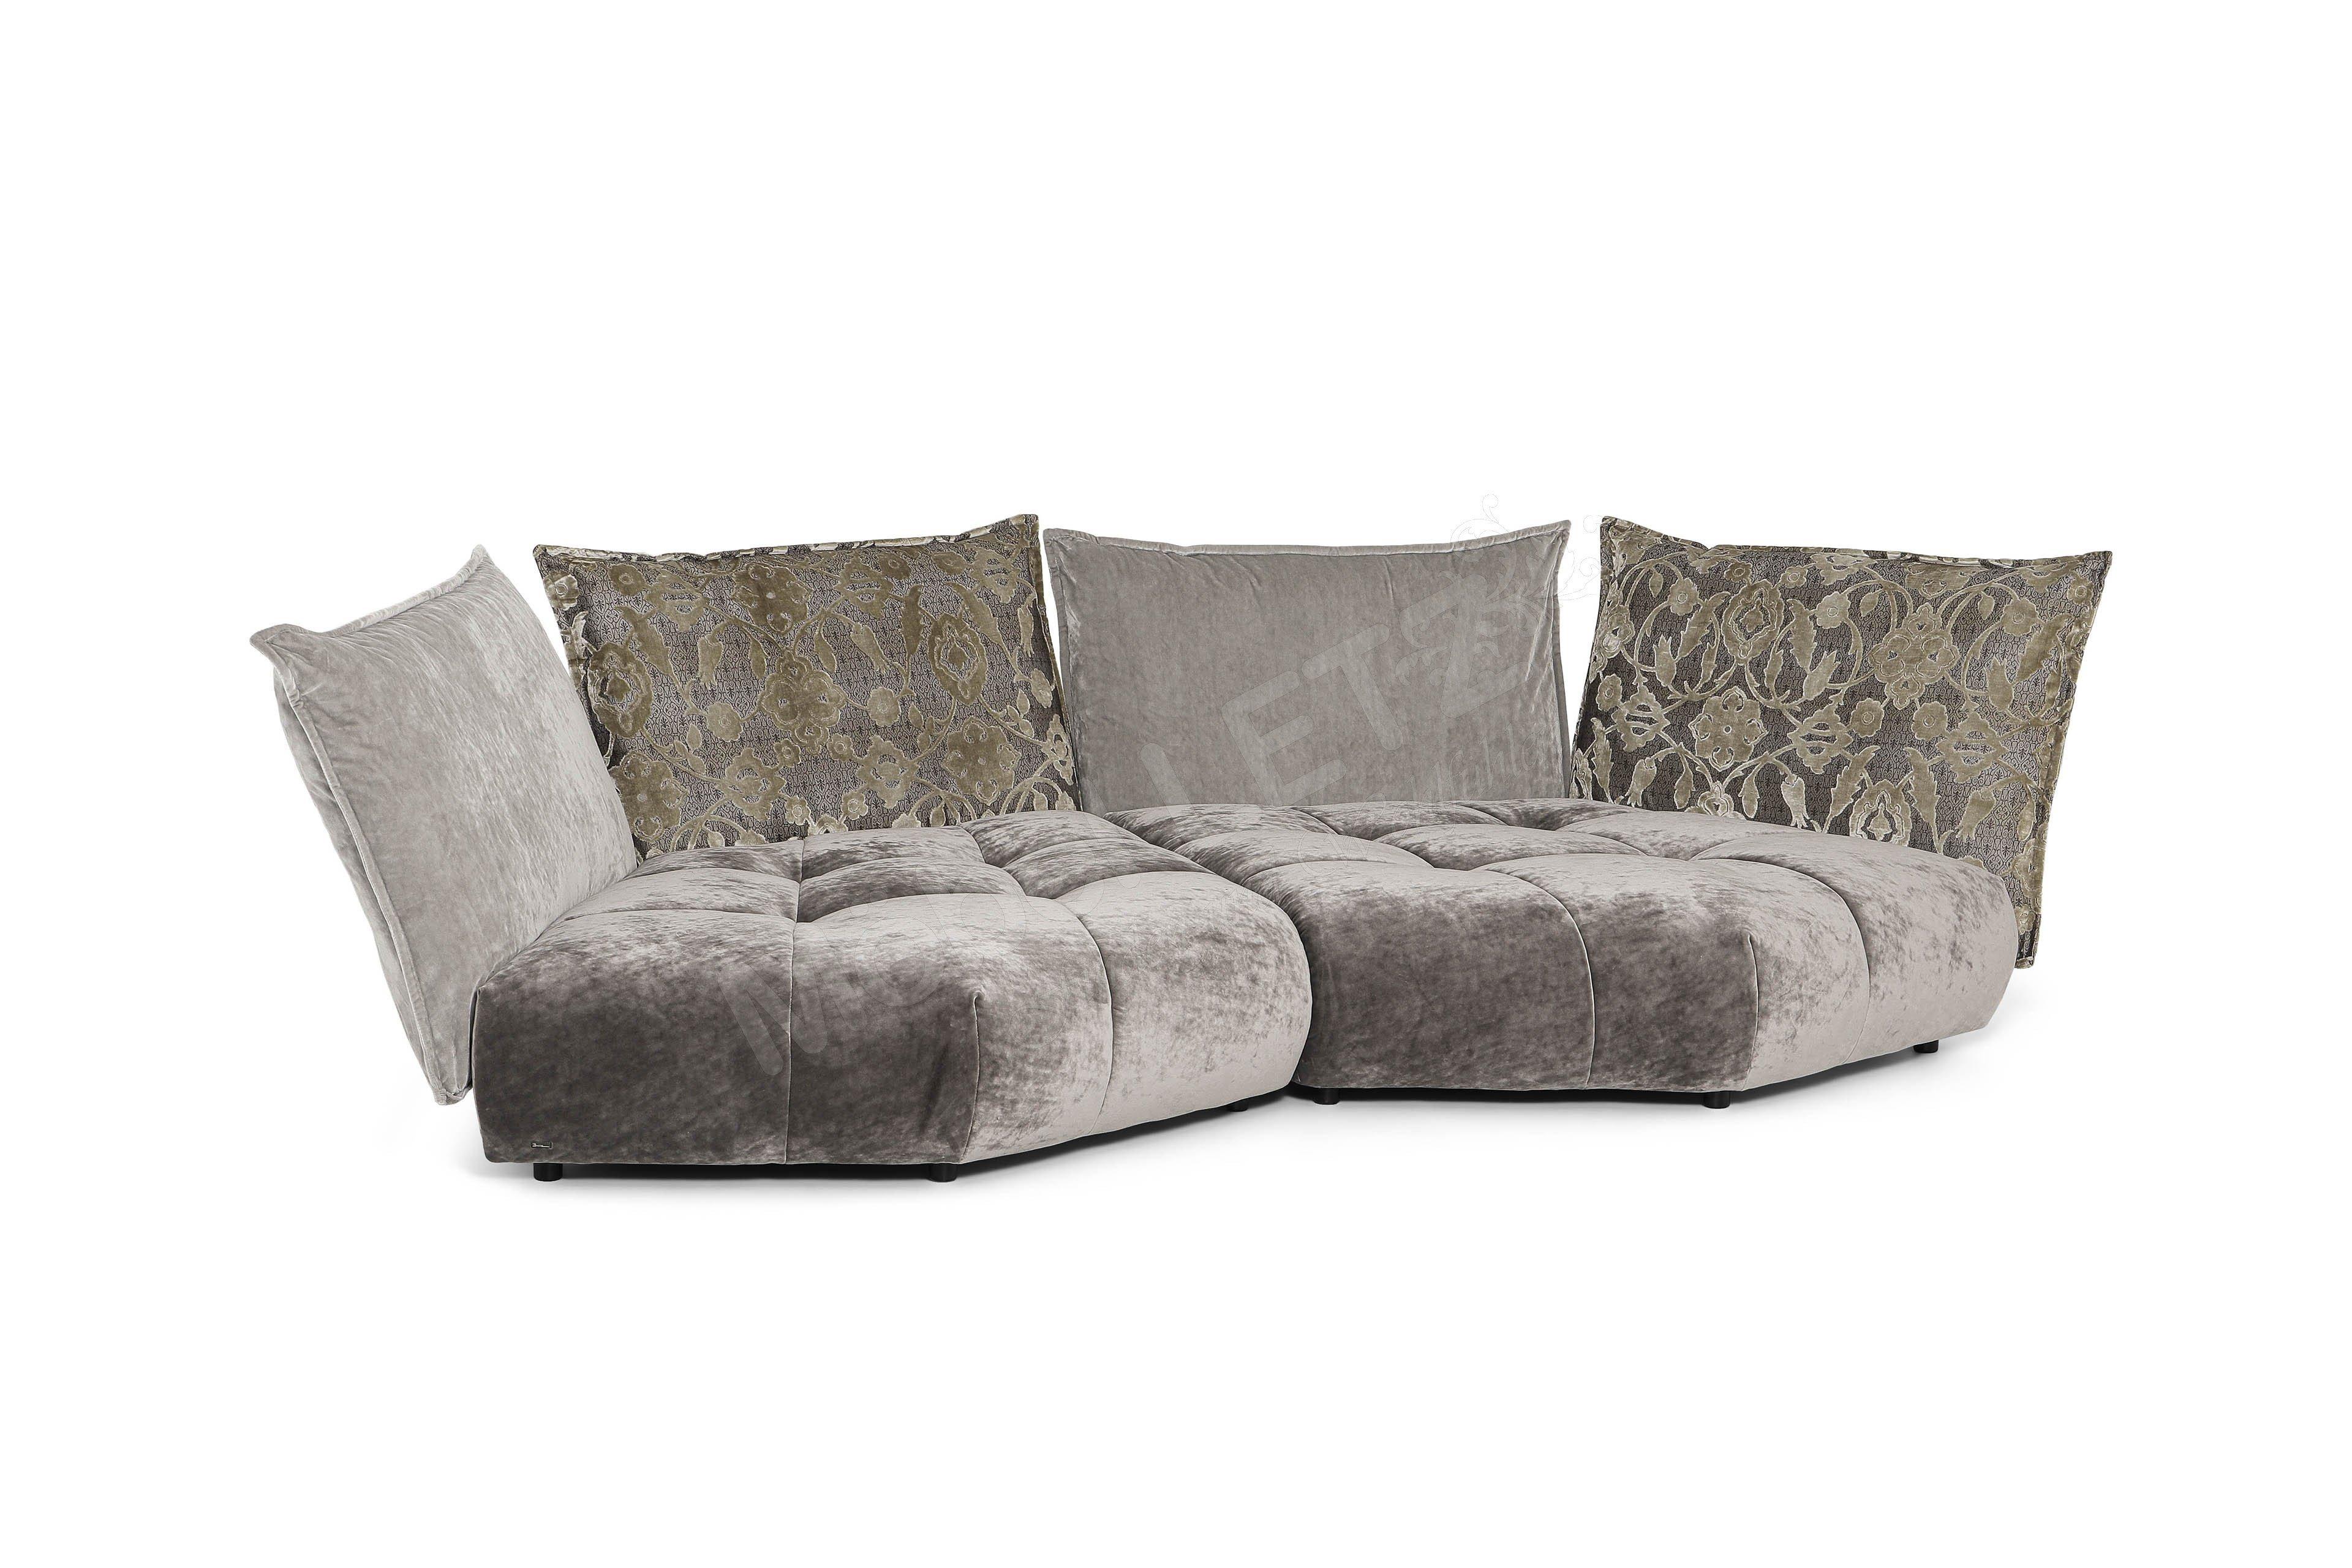 Bretz Möbel bretz sofa preise building1st com